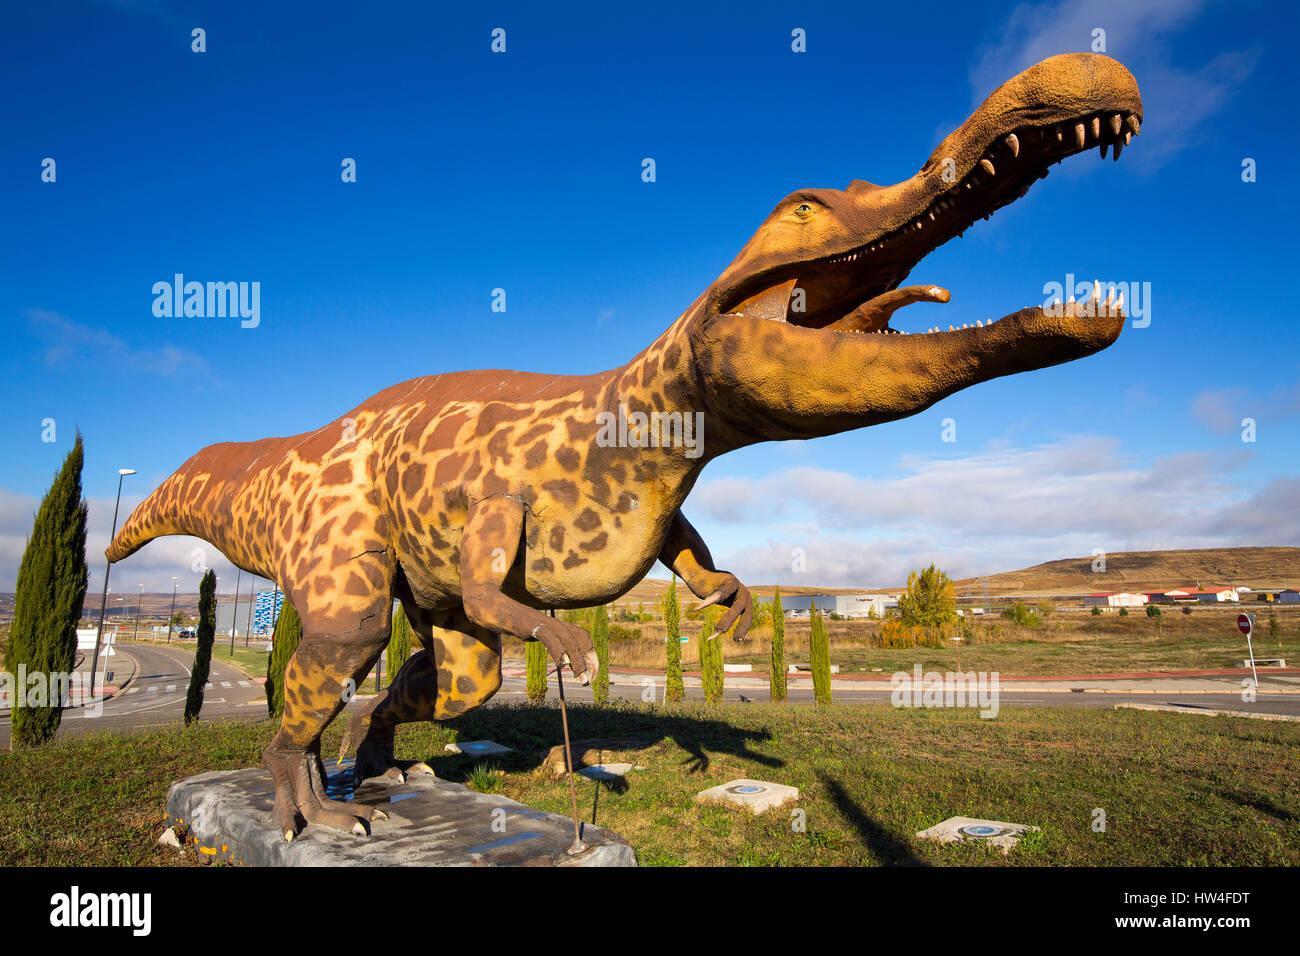 Life size replica of dinosaur in Burgos, Castilla-Leon, Spain Europe - Stock Image